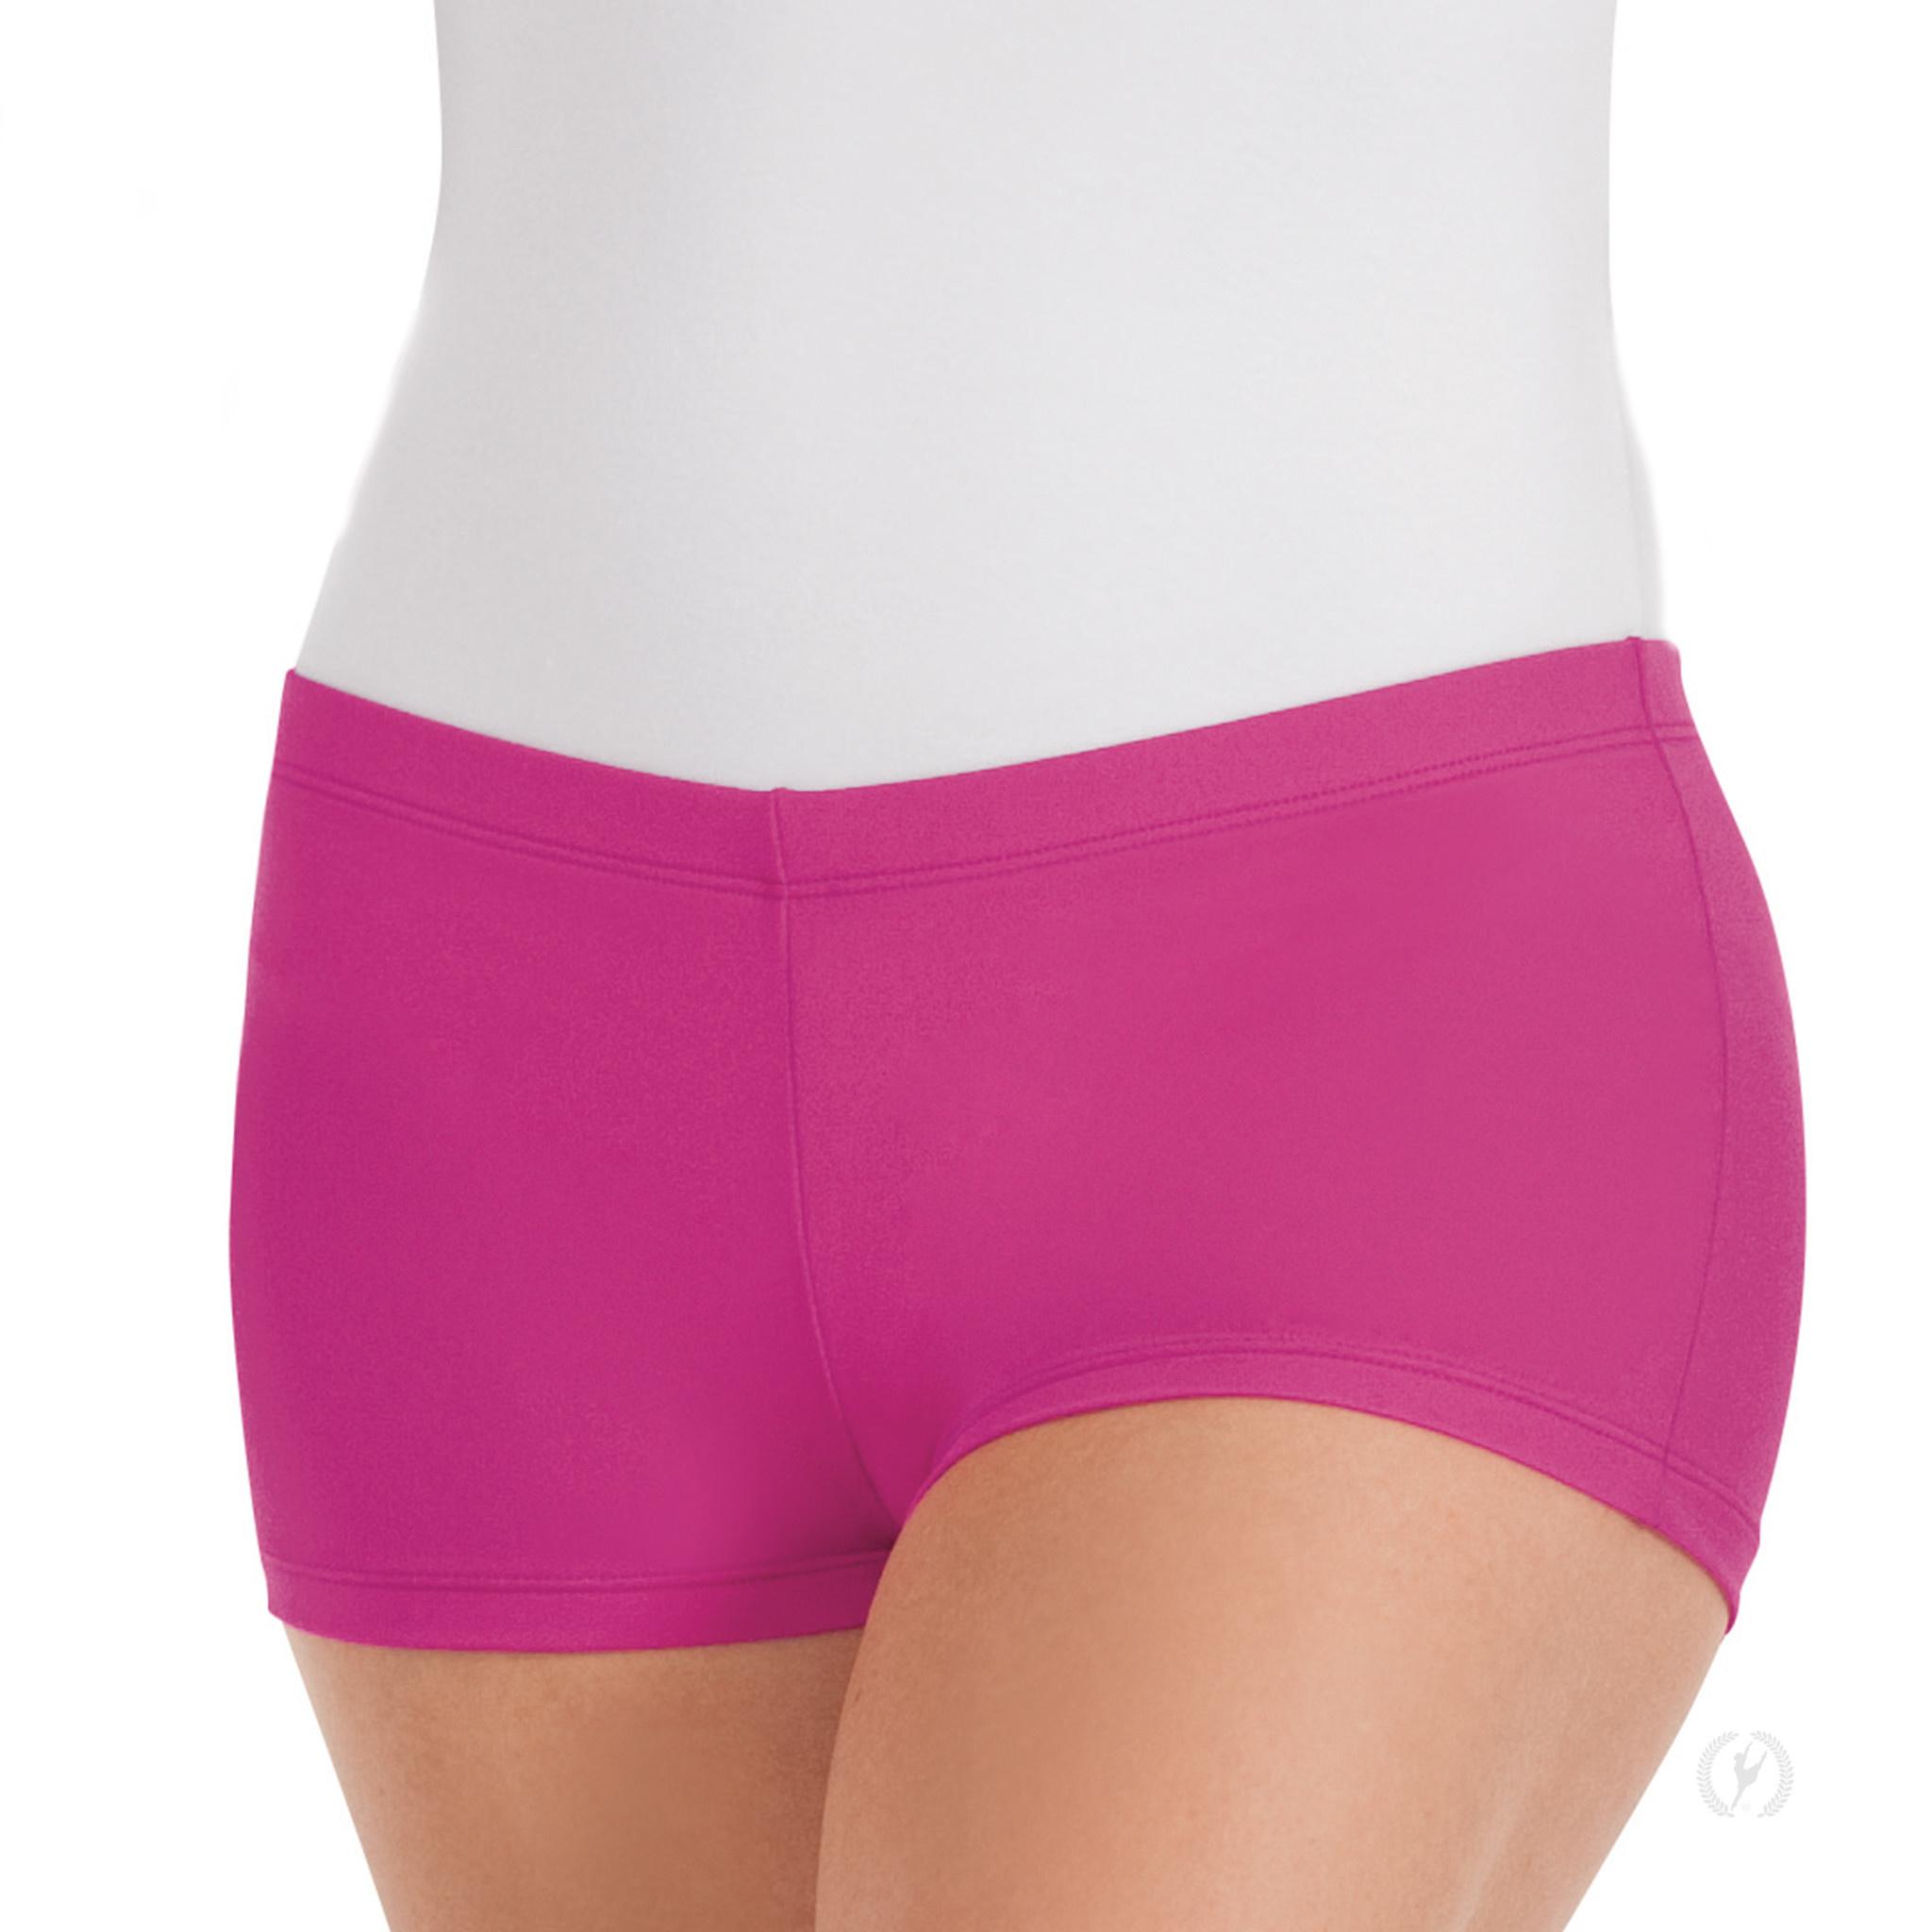 Eurotard 44335 Booty Shorts with Tactel® Microfiber